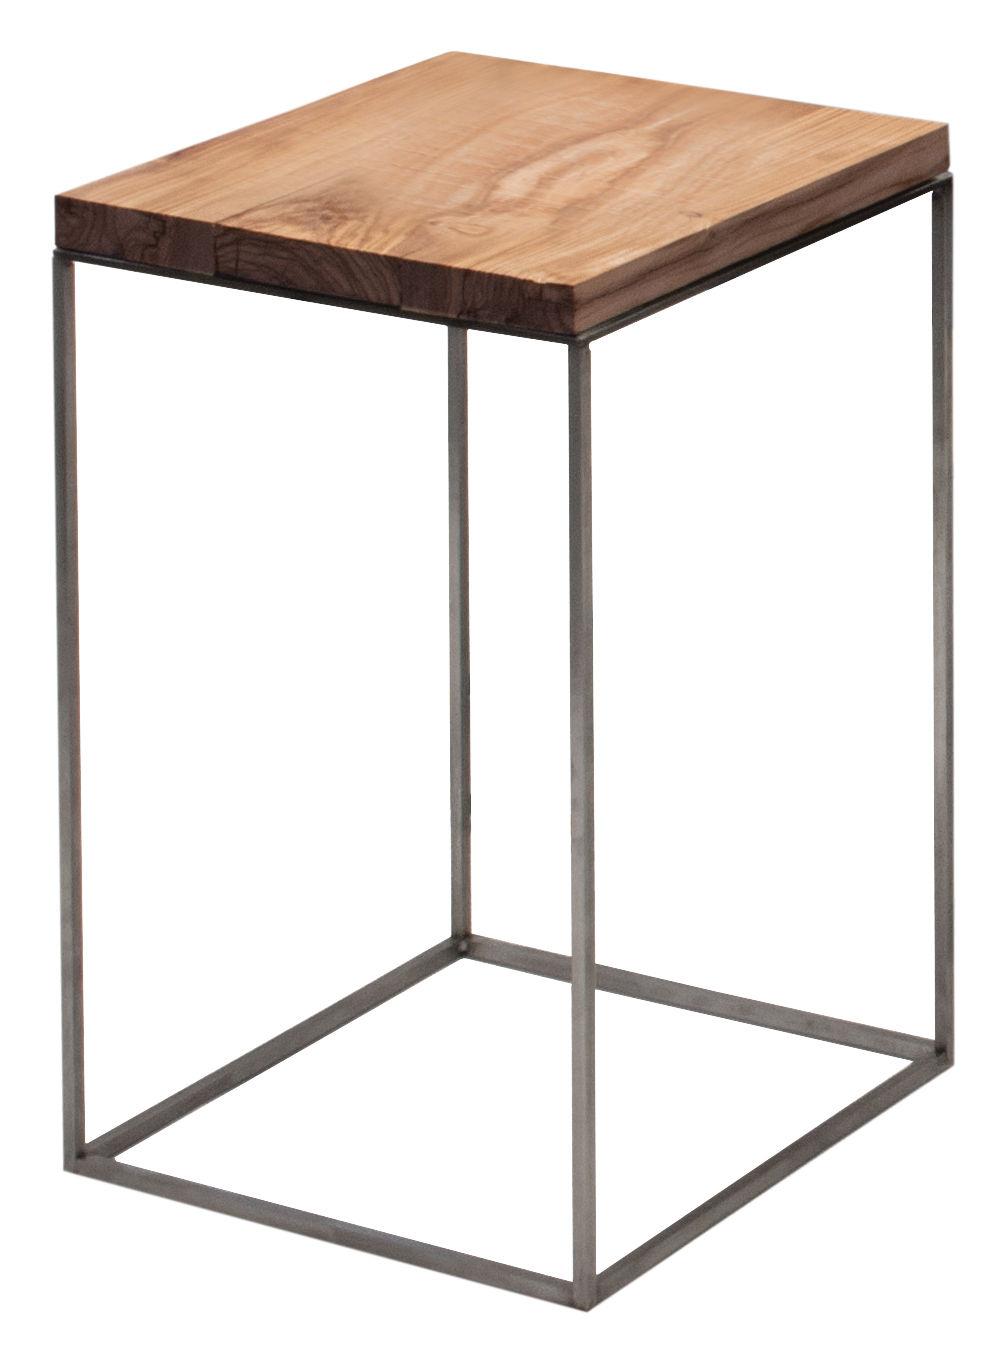 Arredamento - Tavolini  - Tavolino Slim Irony - / 31 x 31 x H 46 cm di Zeus - Top legno / Base nera ramata -  Bois de cèdre, Acciaio